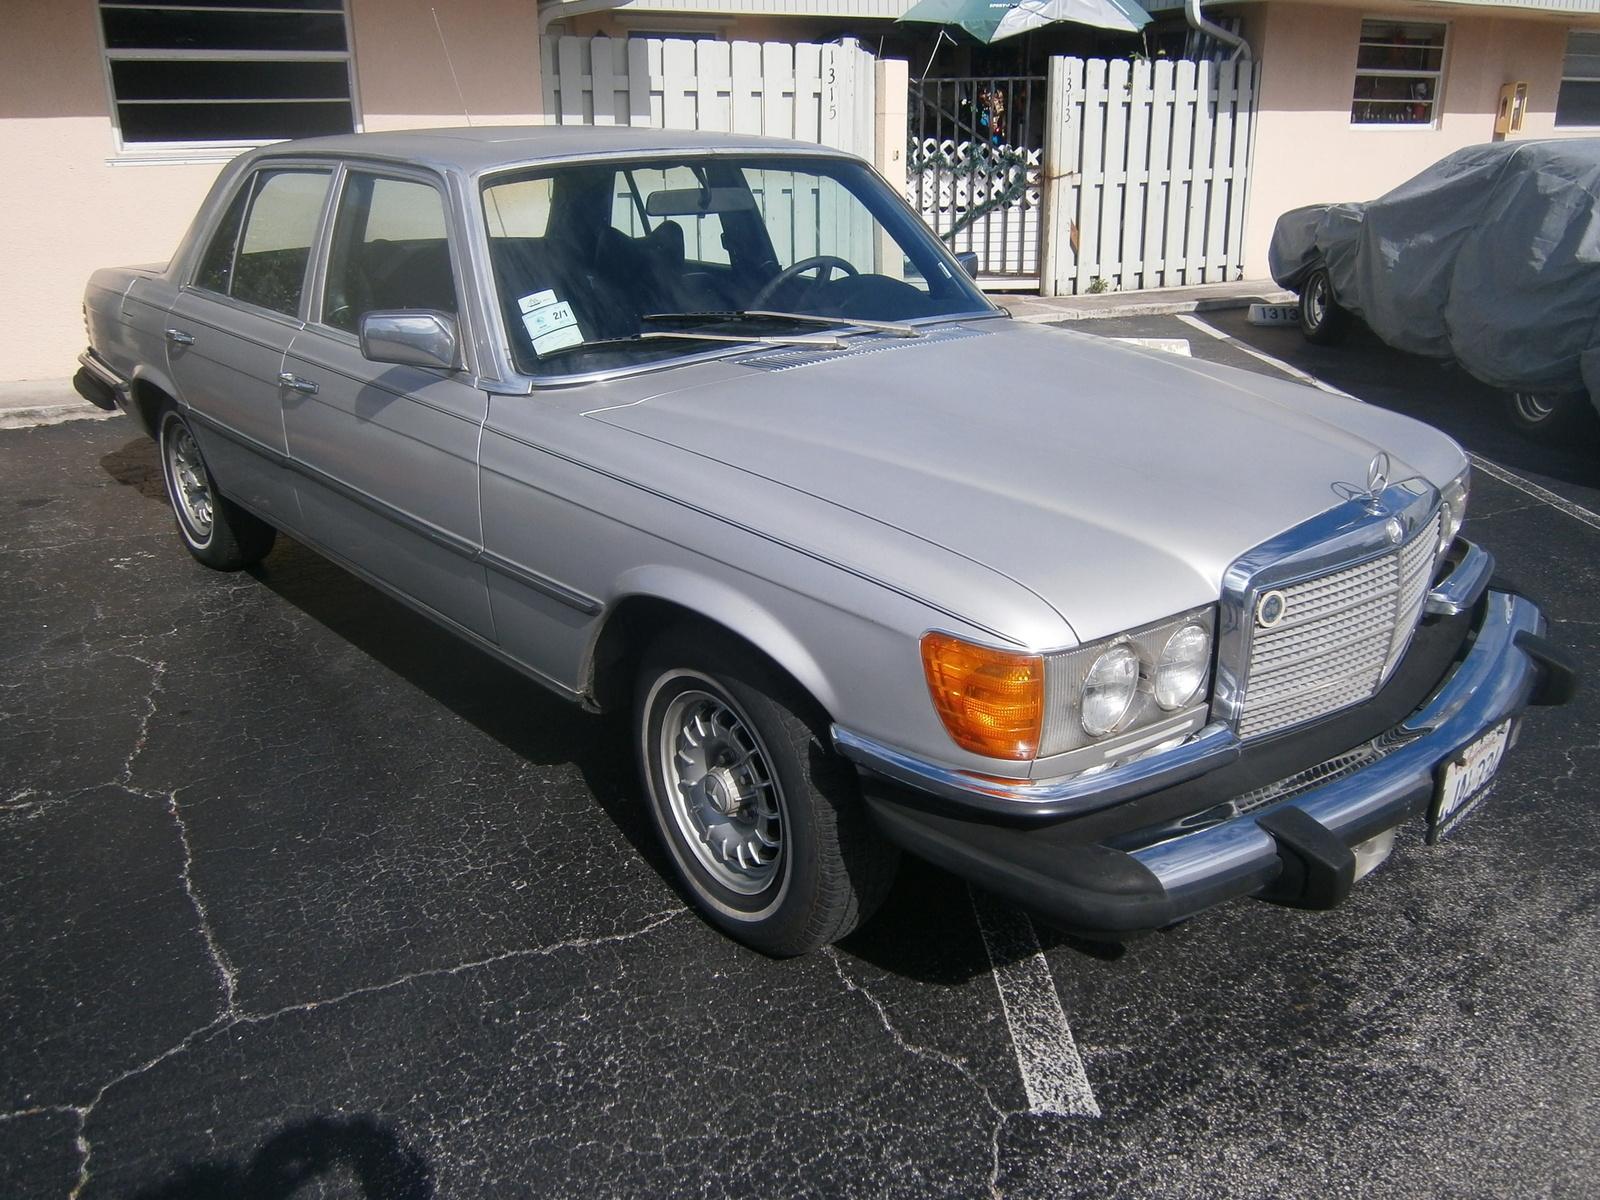 1981 mercedes benz 300 class 300sd turbodiesel sedan for 1981 mercedes benz 300sd